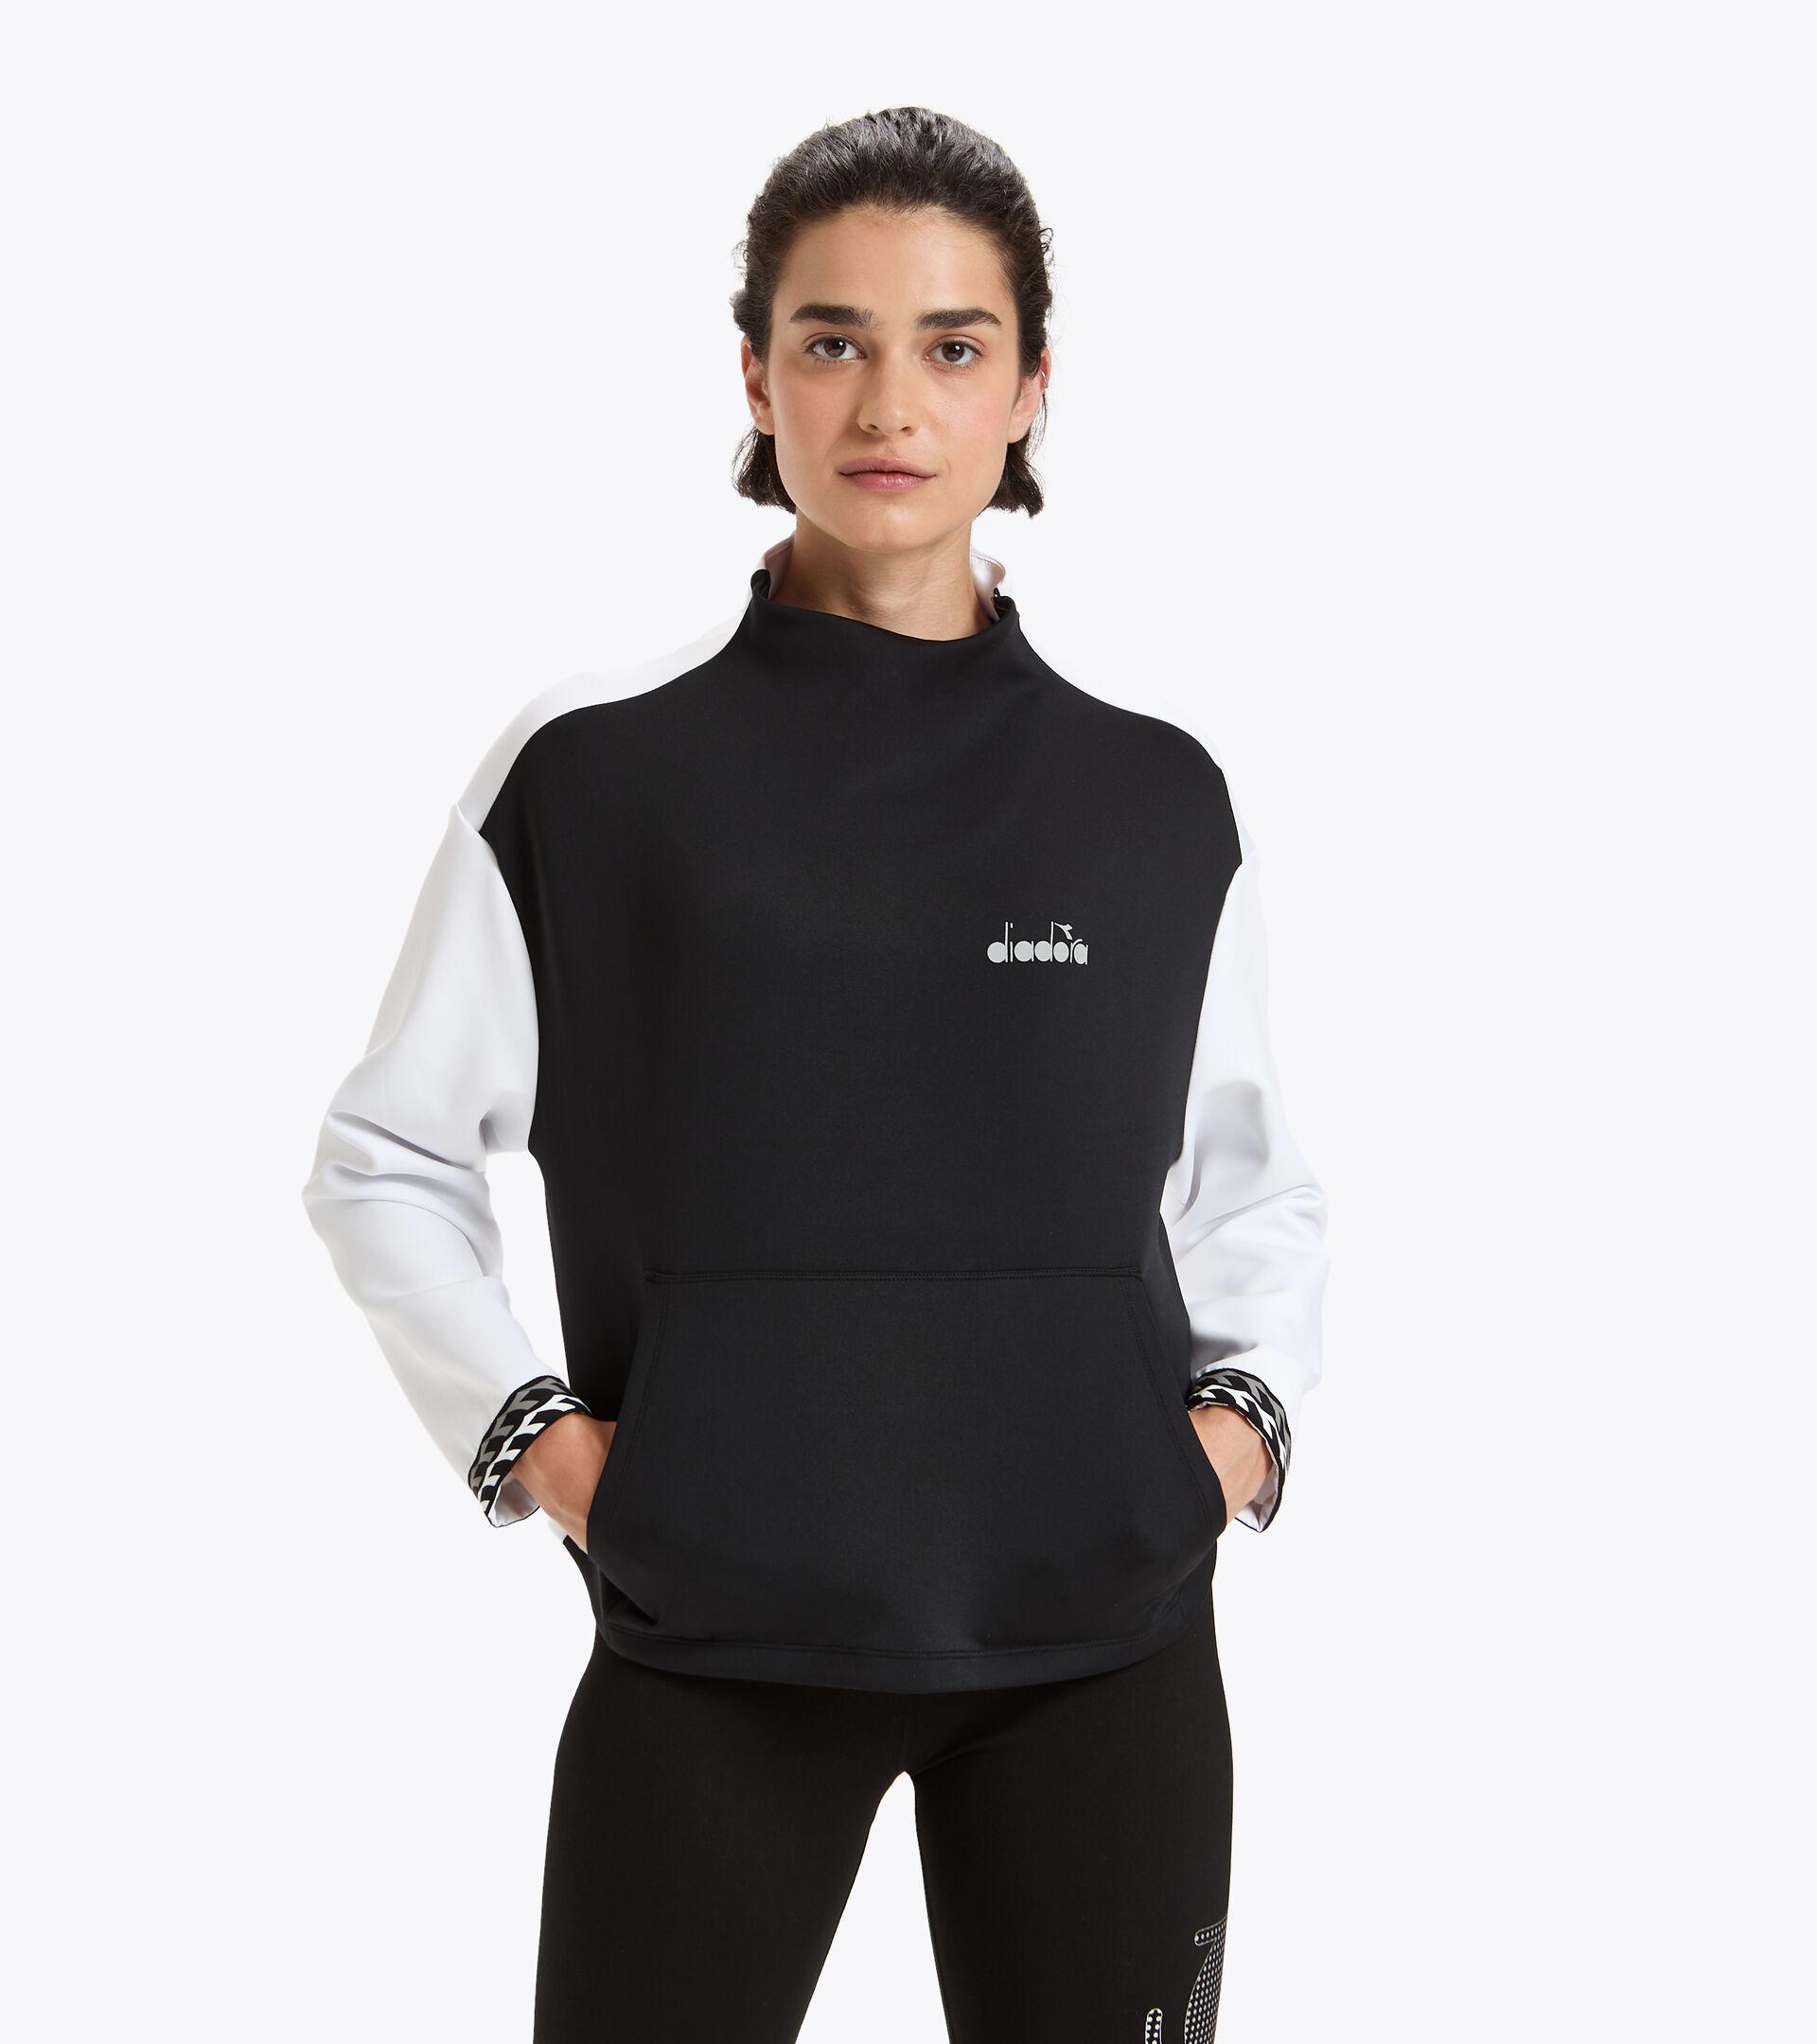 Lauf-Sweater - Damen L. SWEAT BE ONE WEISS/SCHWARZ - Diadora